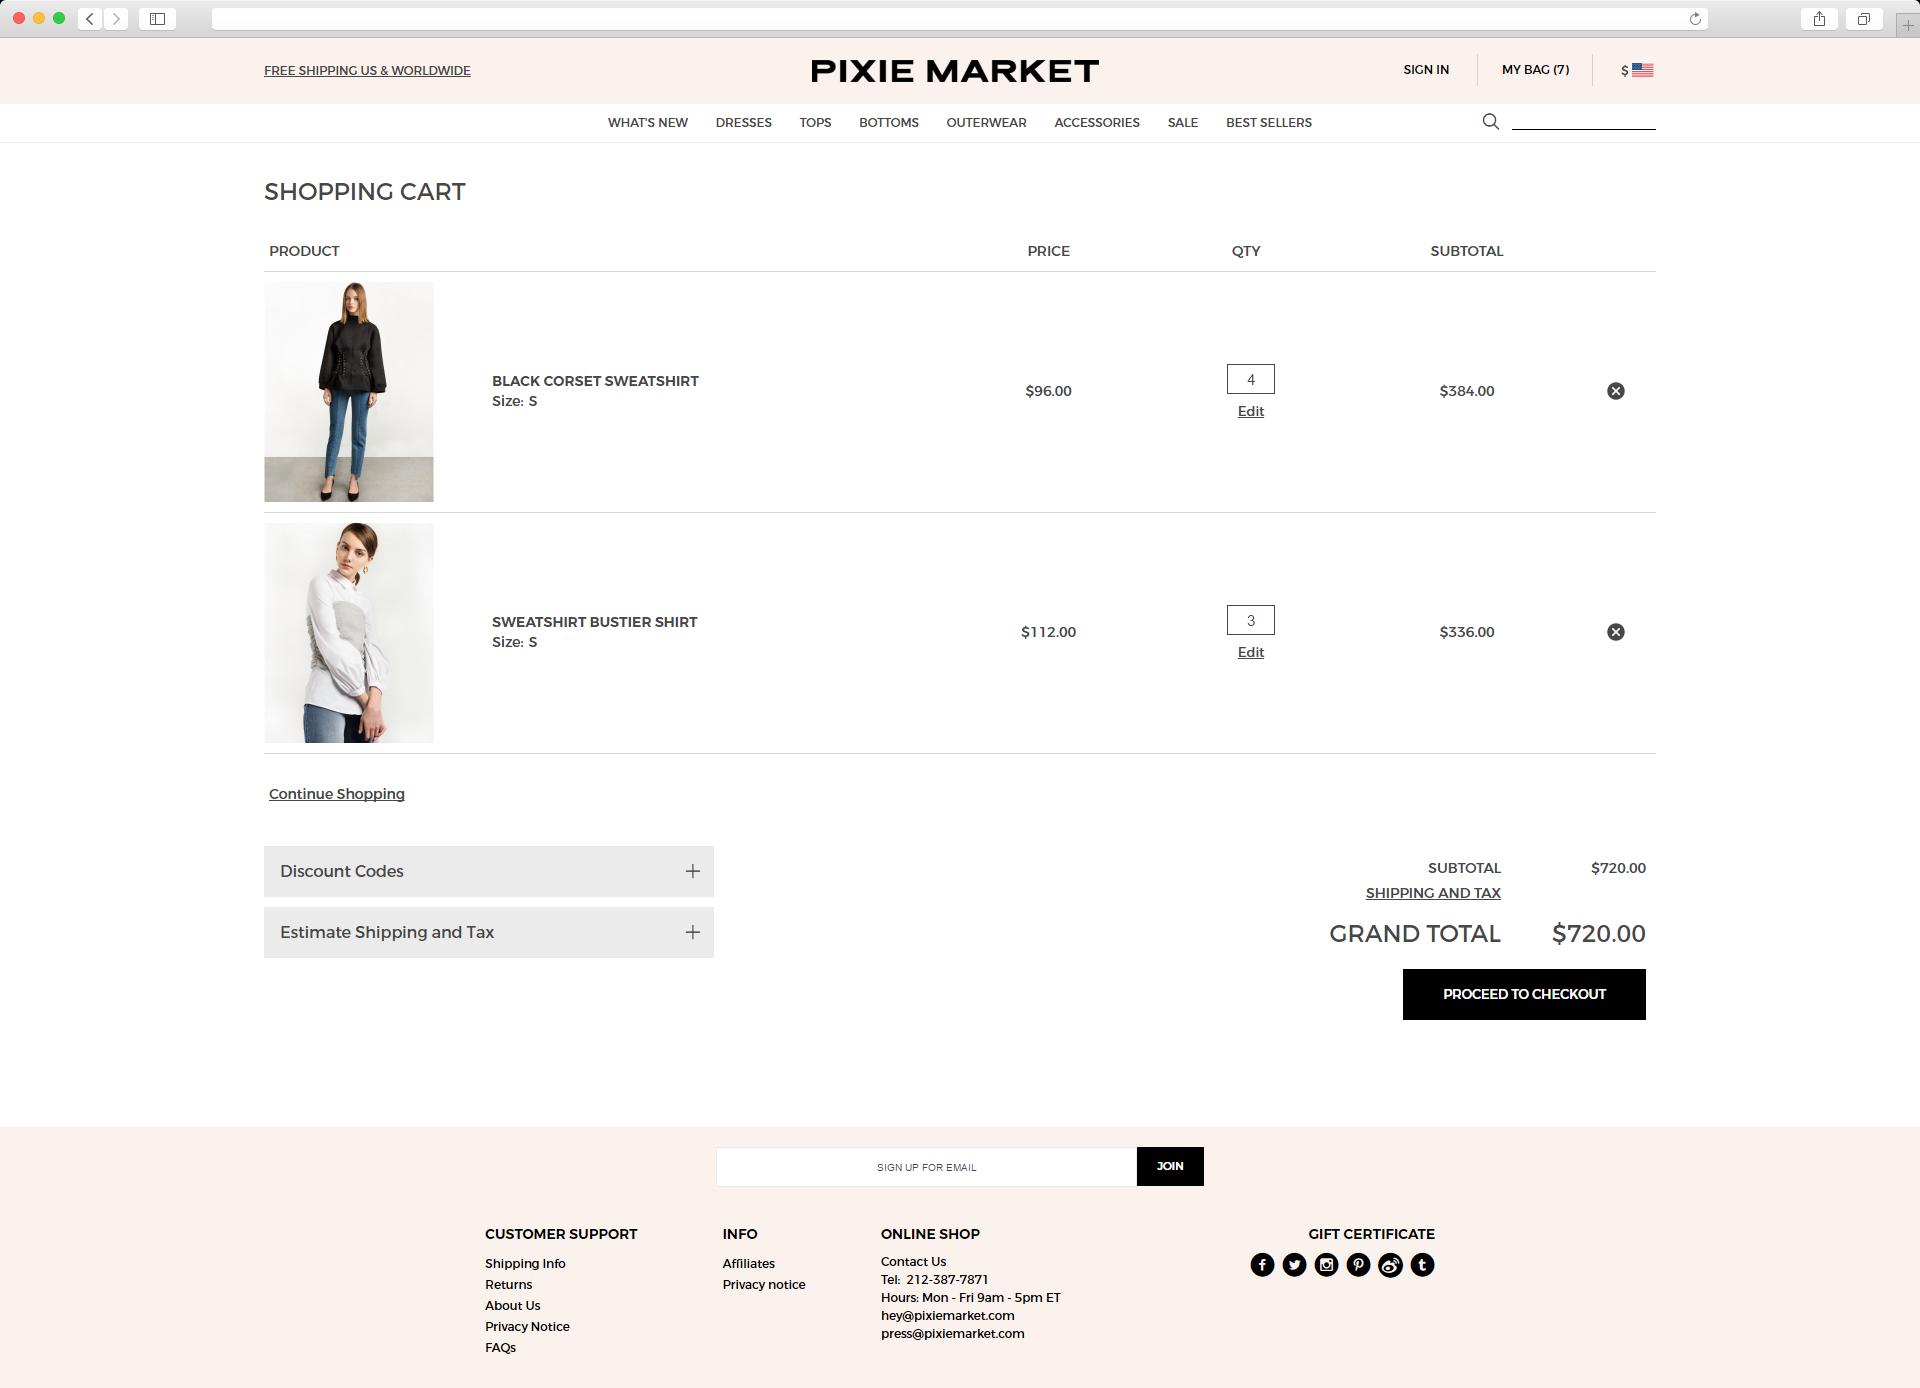 pixiemarket_cart